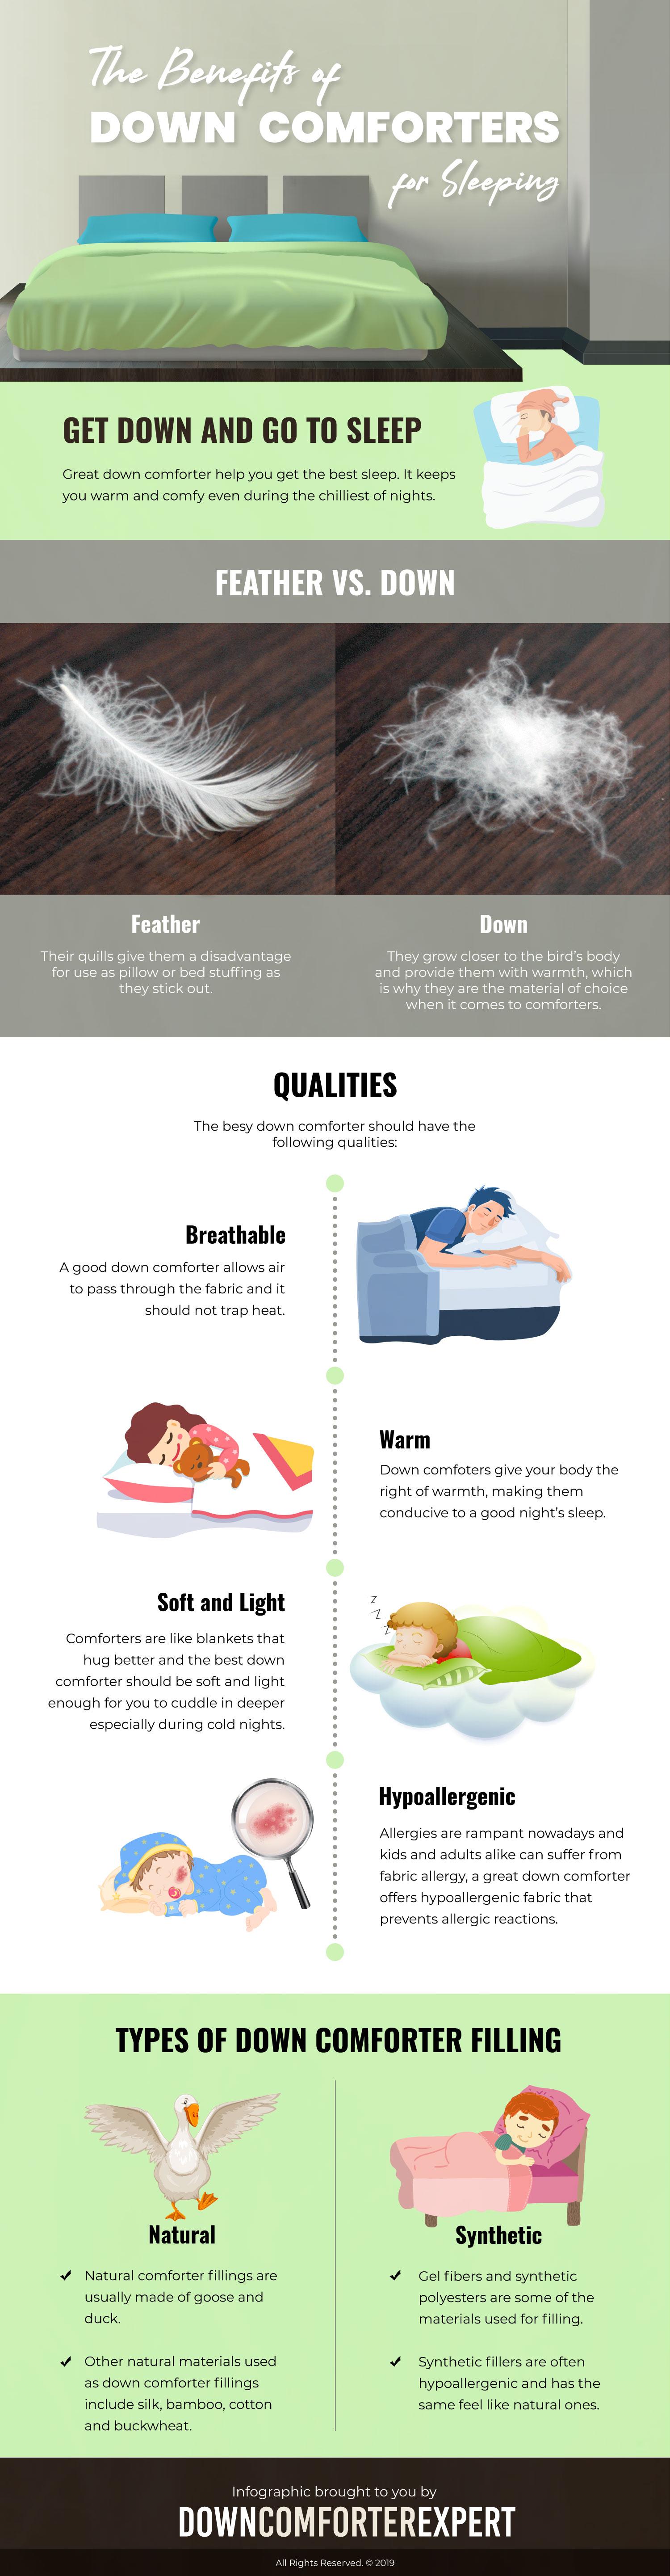 Benefits Down Comforter for Sleeping